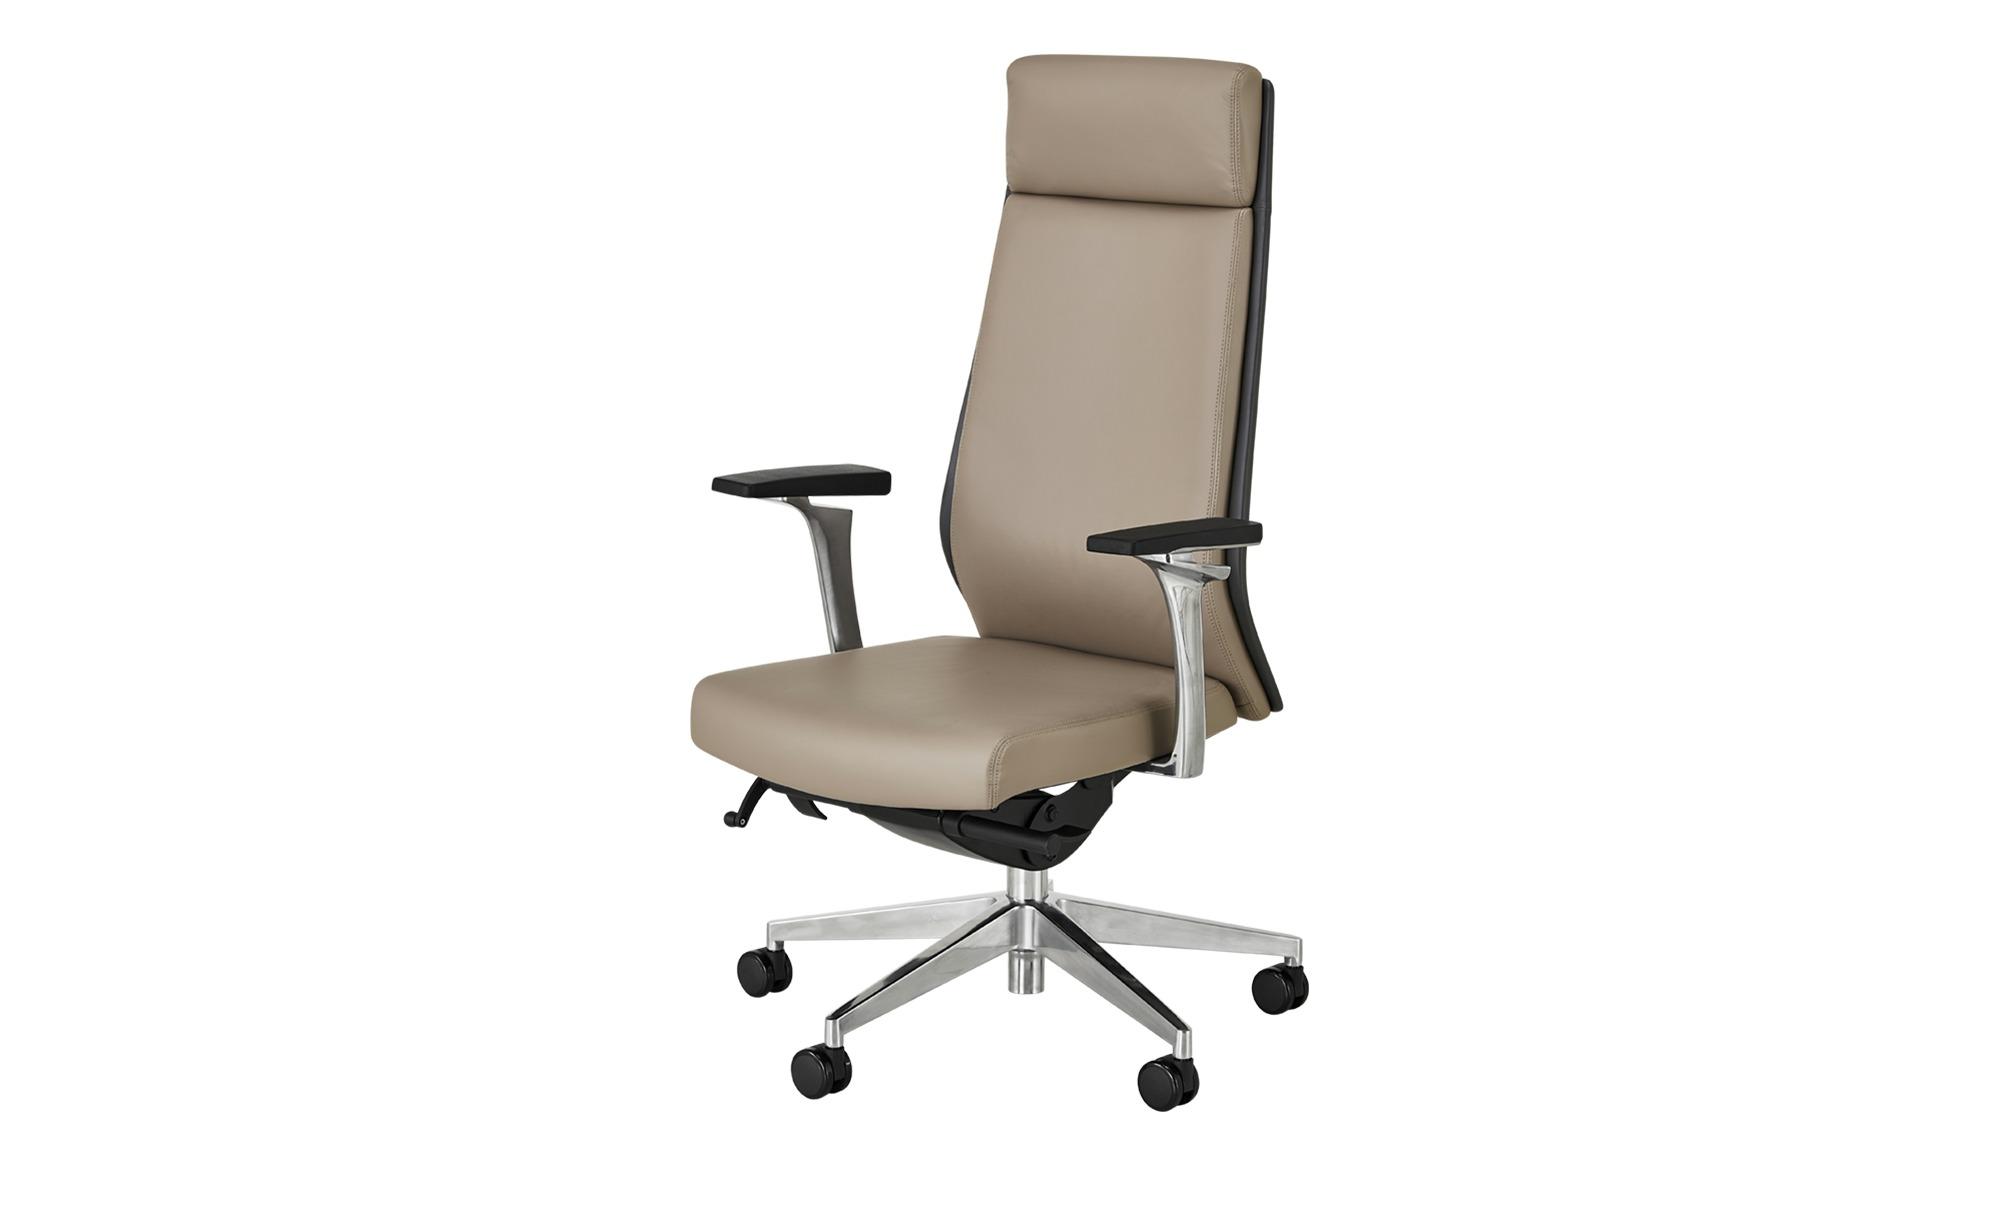 Chefsessel  Schede ¦ grau Stühle > Bürostühle > Chefsessel - Höffner | Büro > Bürostühle und Sessel  > Chefsessel | Grau | Kunstleder - Echtleder | Möbel Höffner DE